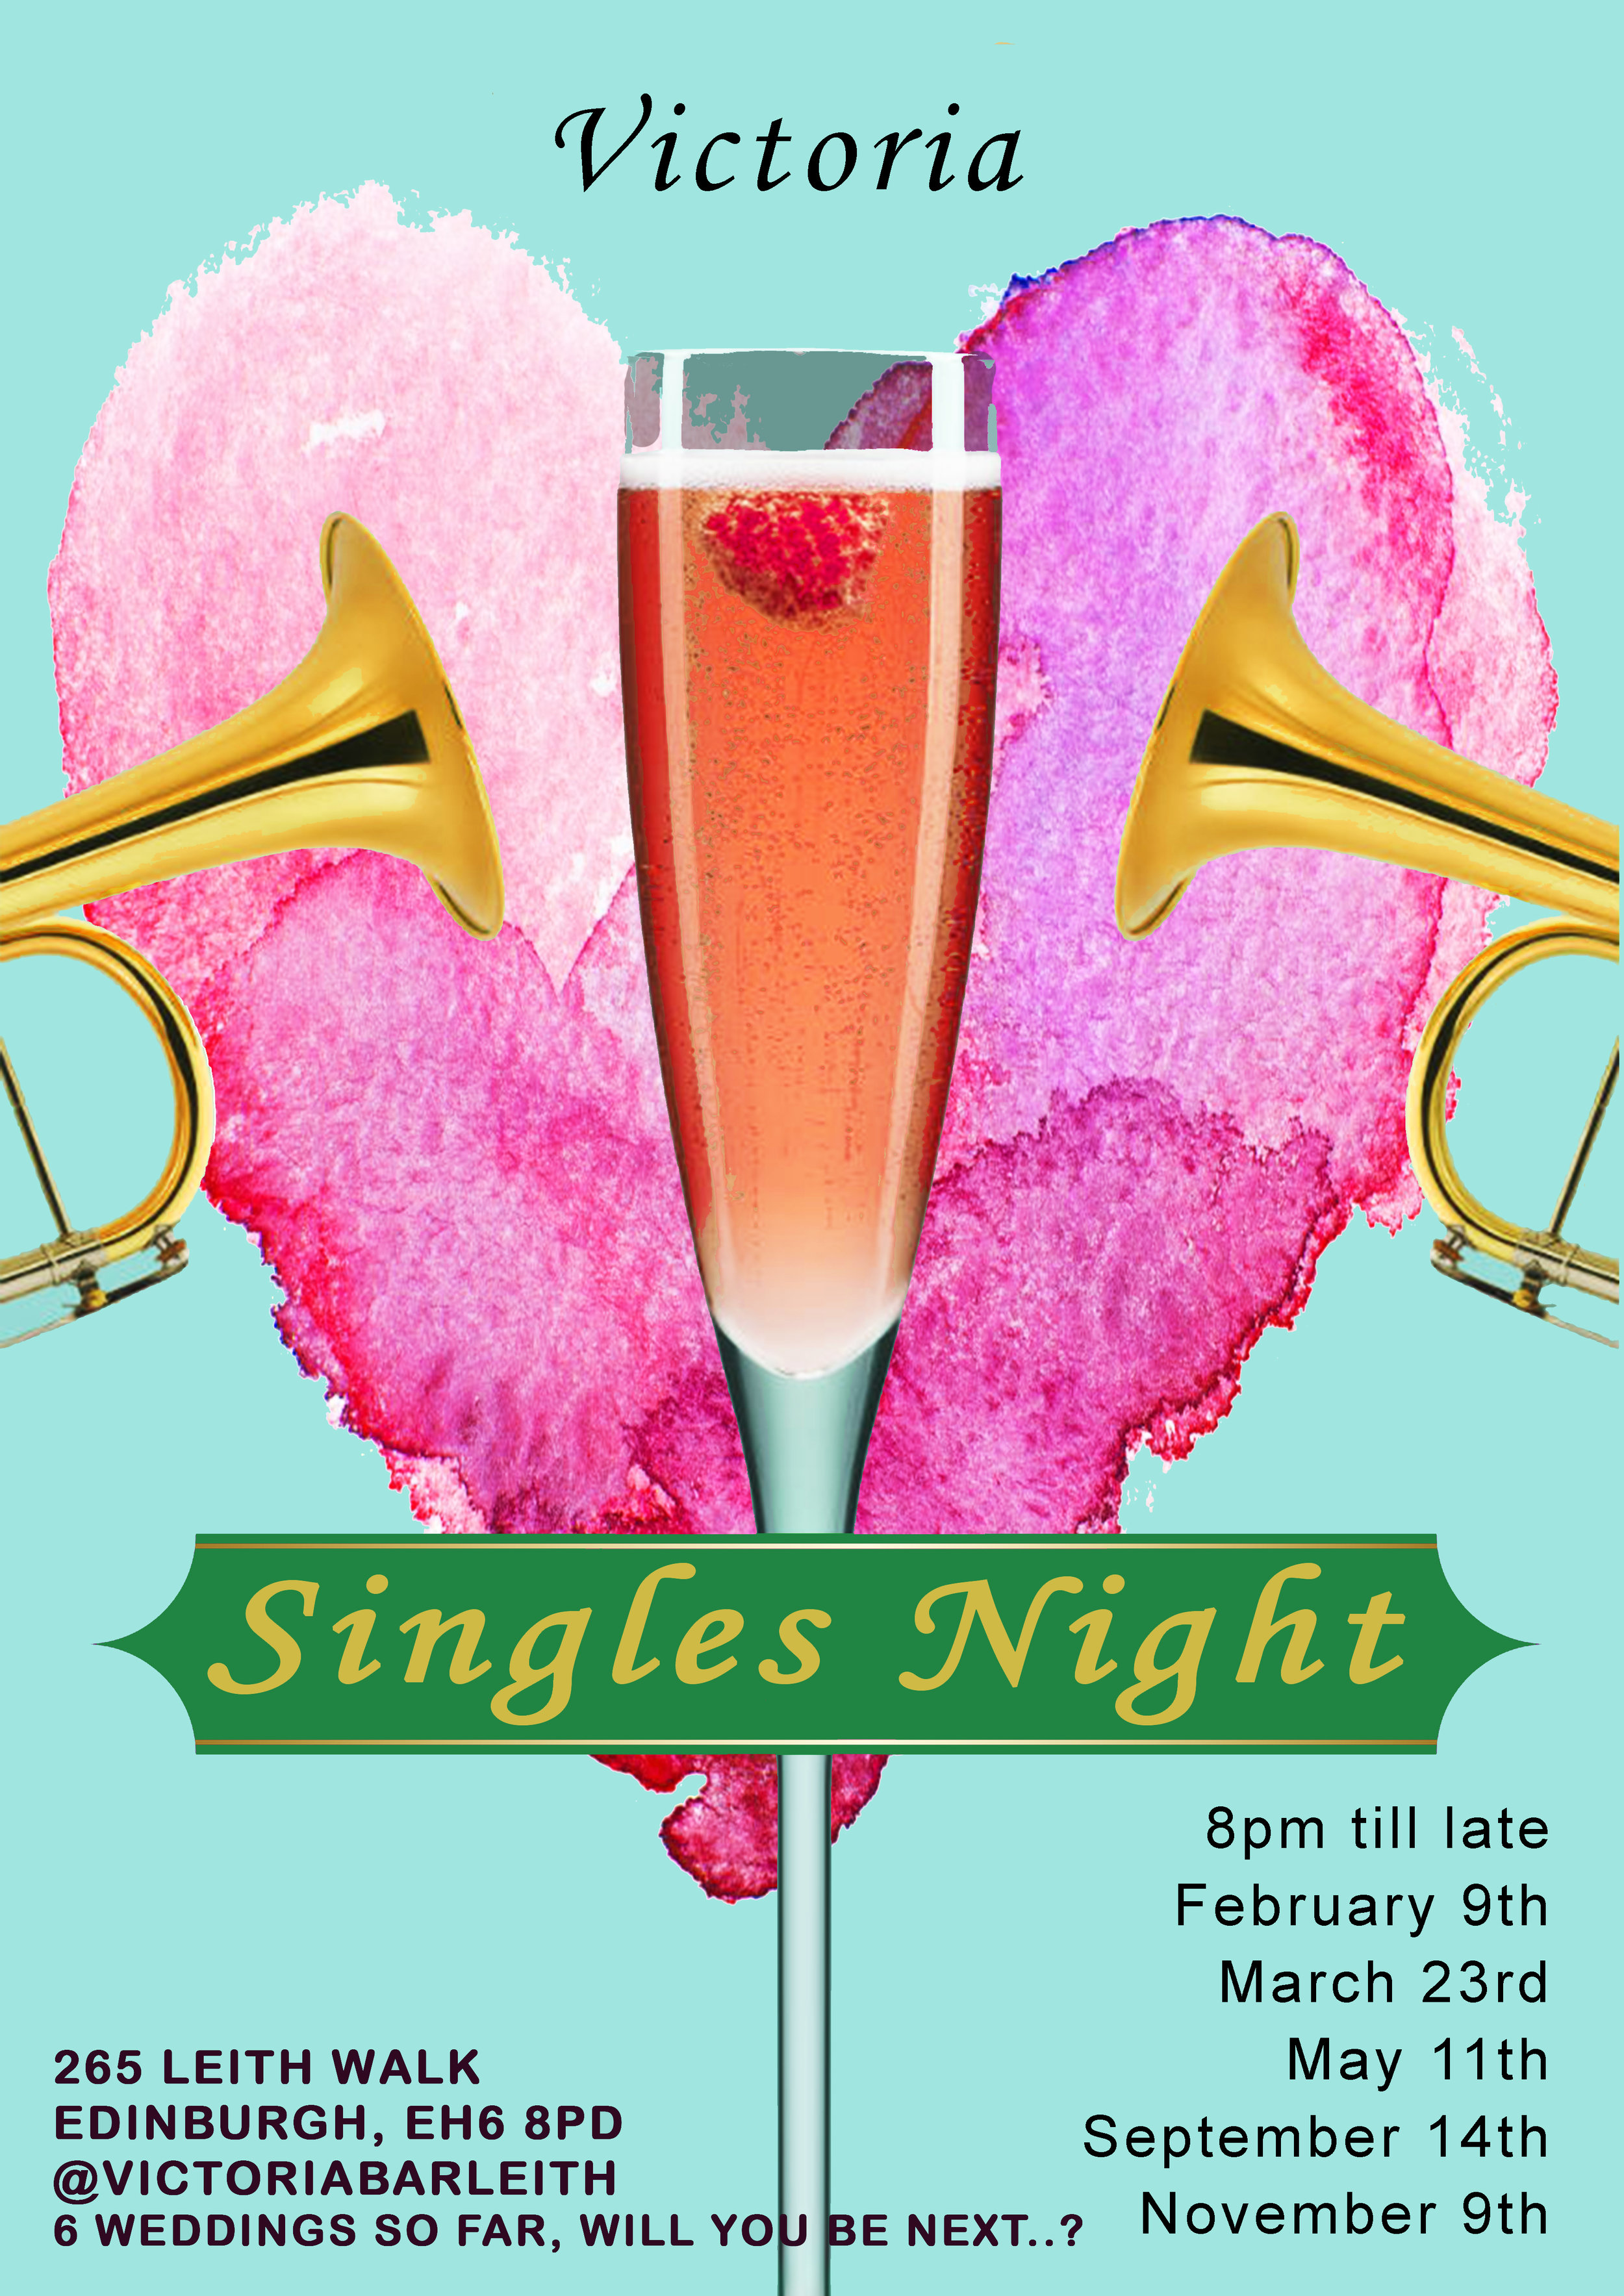 Single speed dating Edynburg